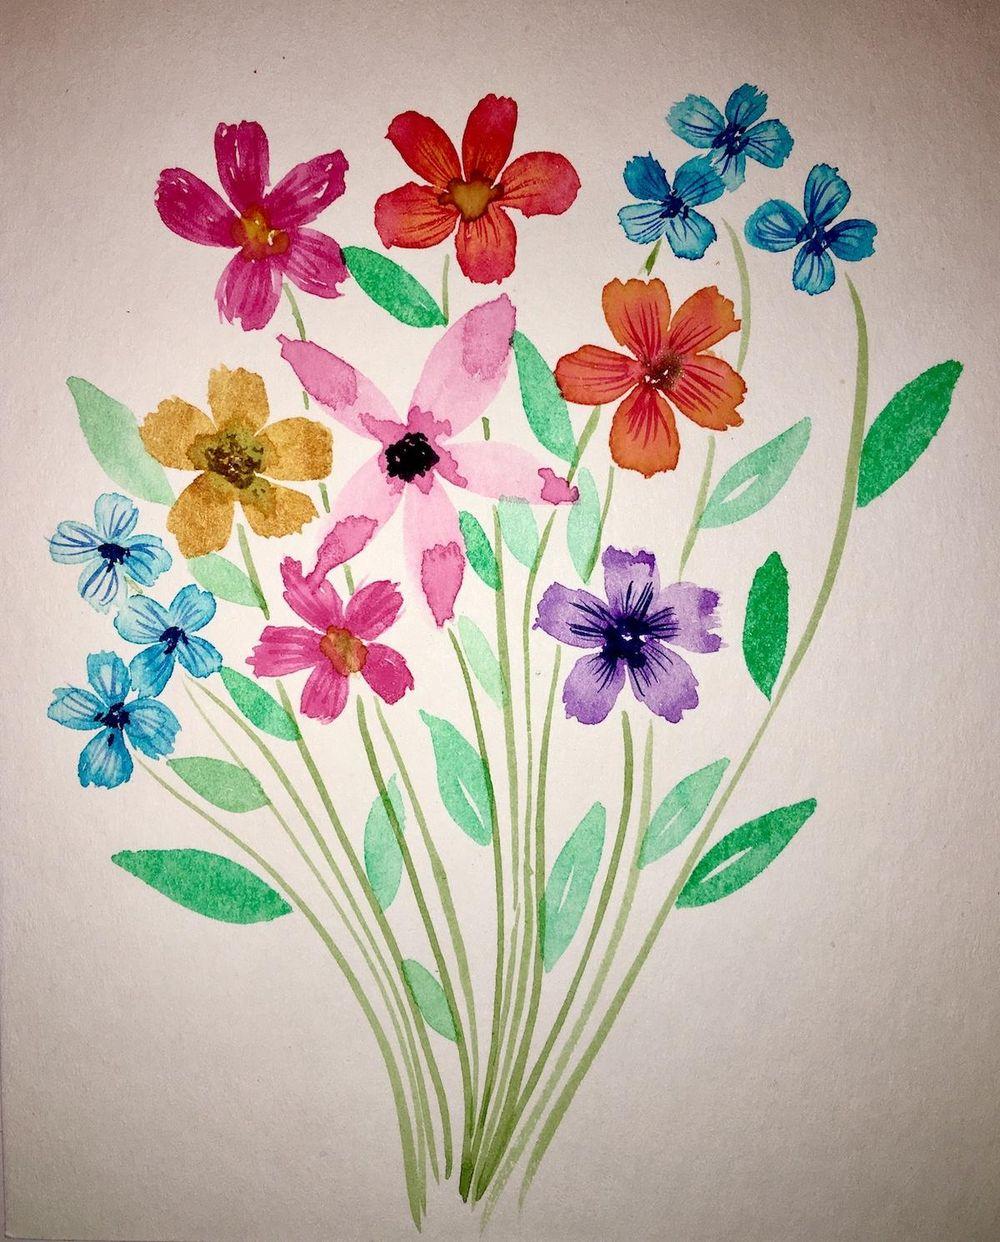 5 Petals flower - image 1 - student project